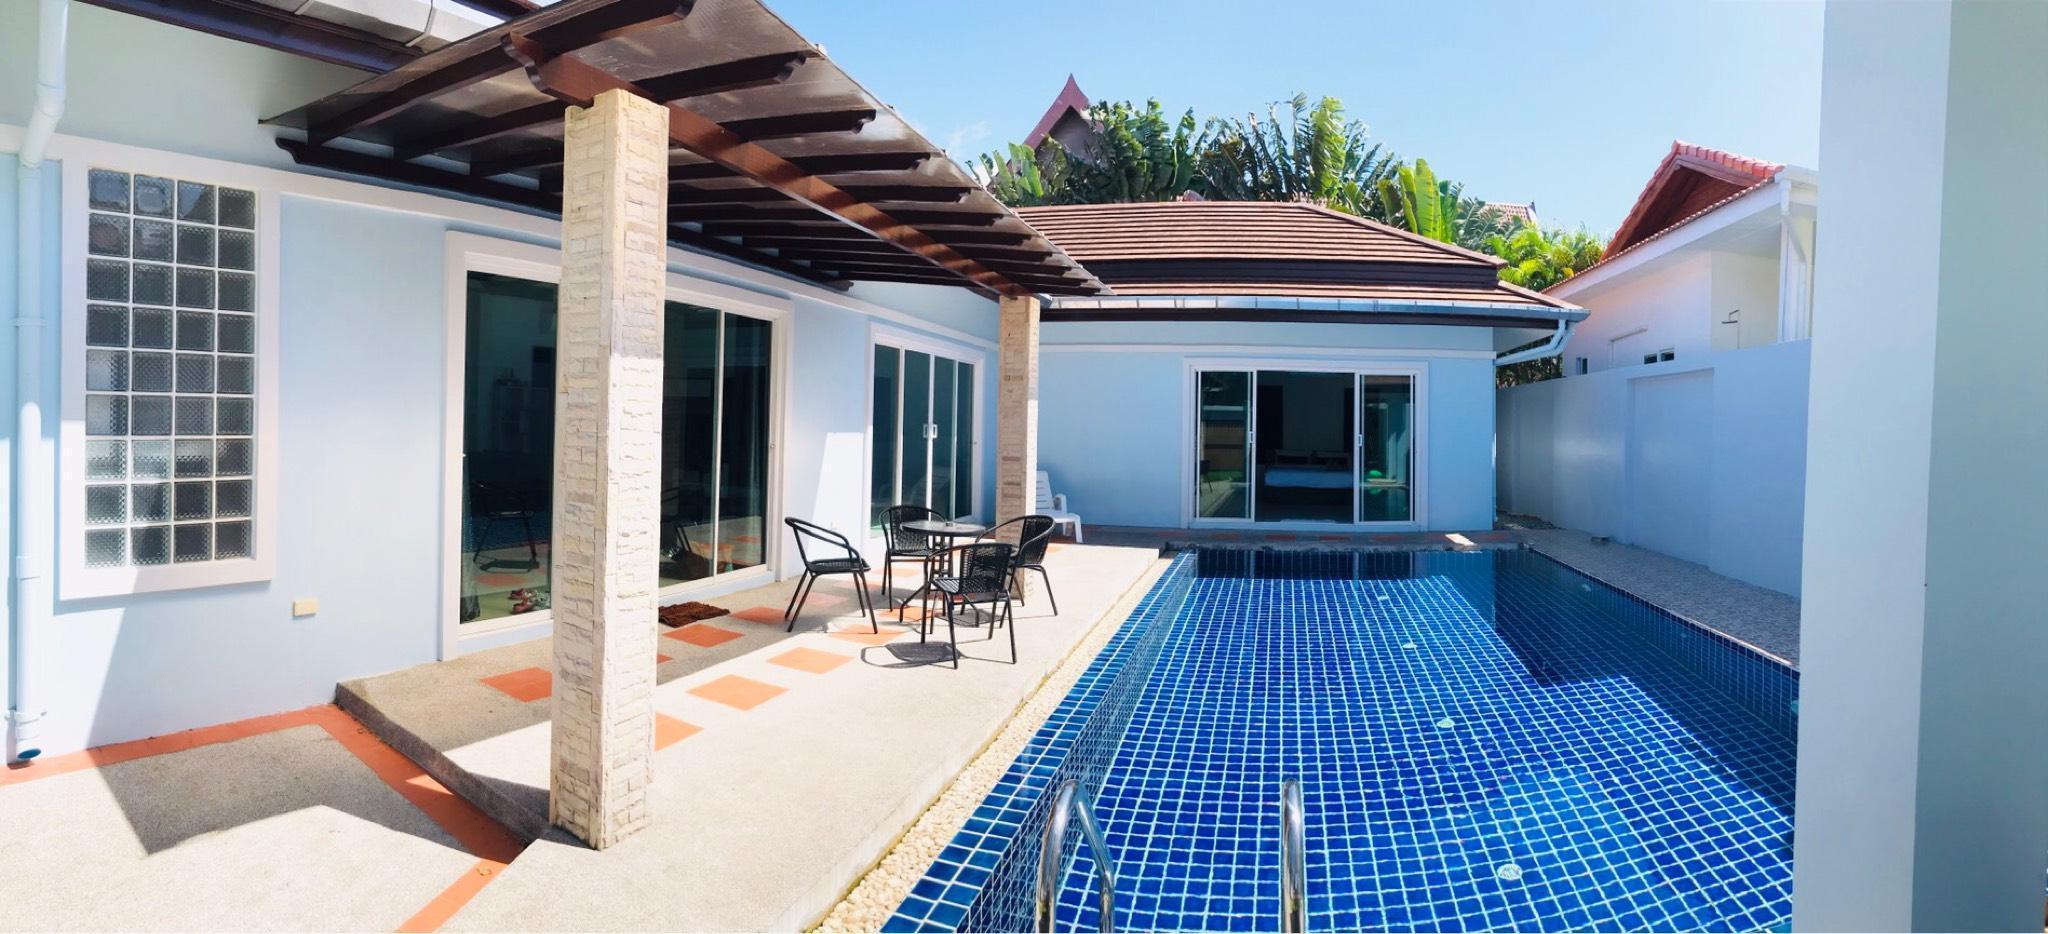 Charin Villa วิลลา 2 ห้องนอน 2 ห้องน้ำส่วนตัว ขนาด 400 ตร.ม. – หาดราไวย์